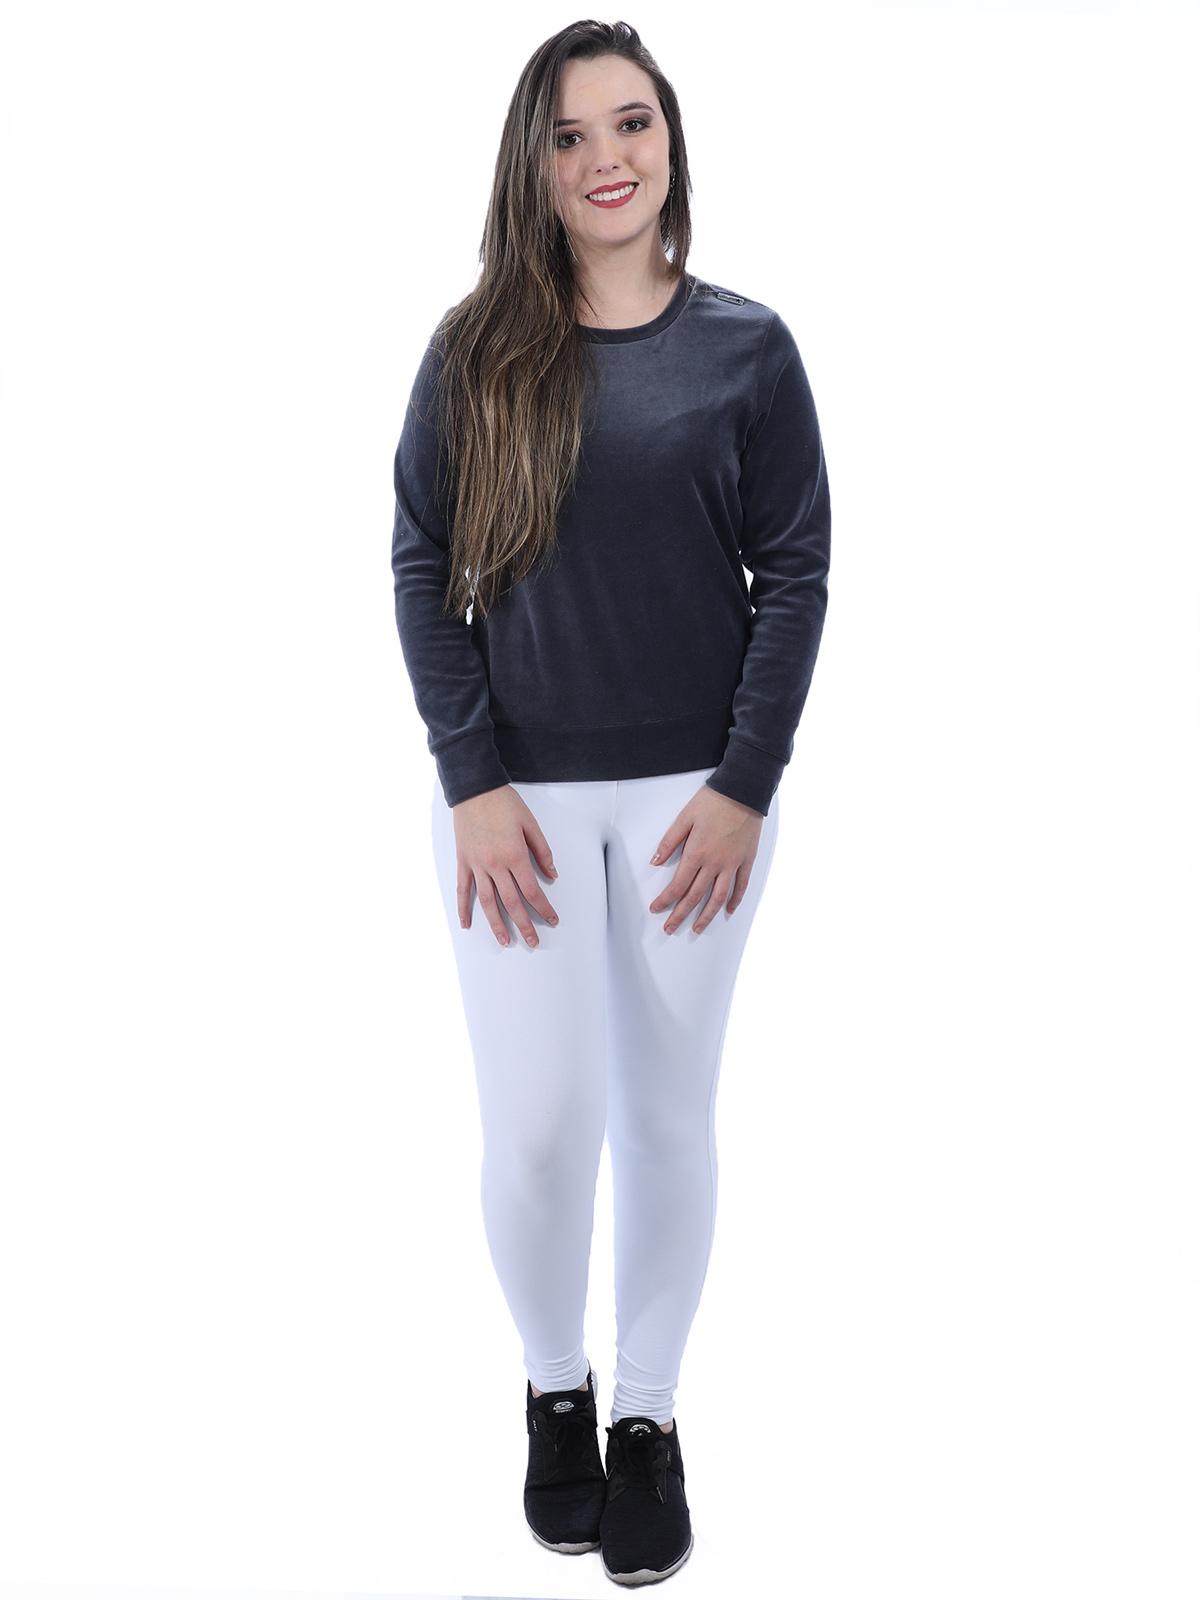 Kit 3 Calças Legging Grossa Feminina PRETA, BRANCA, MARROM